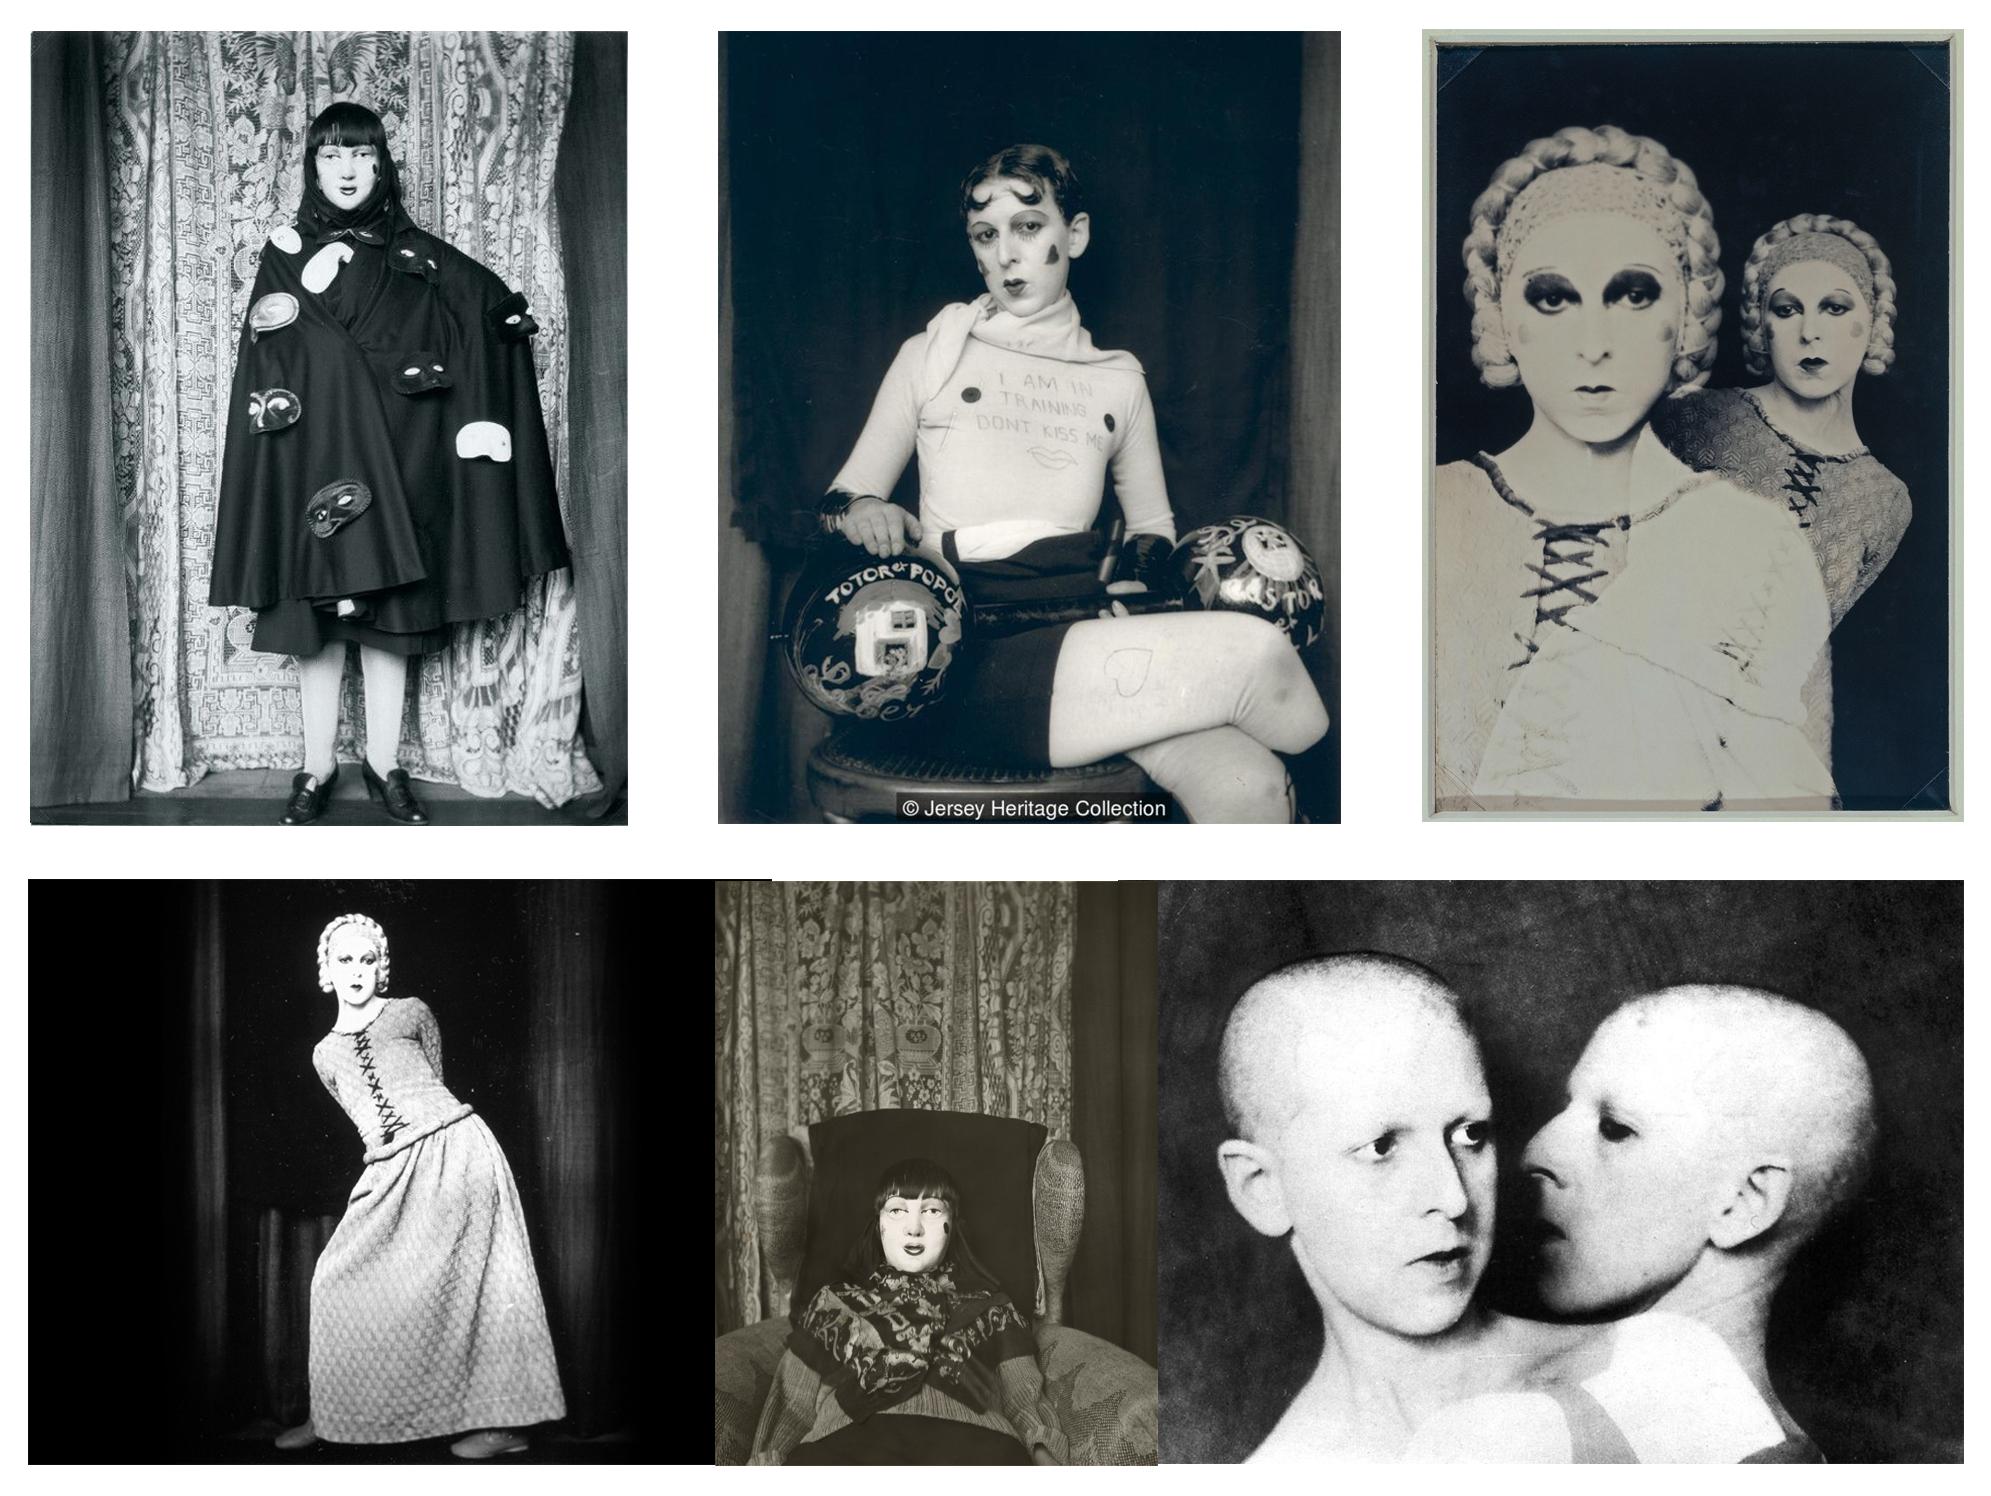 Claude Cahun // Collection // Paris // 1920's and 30's // Silver Gelatin Print